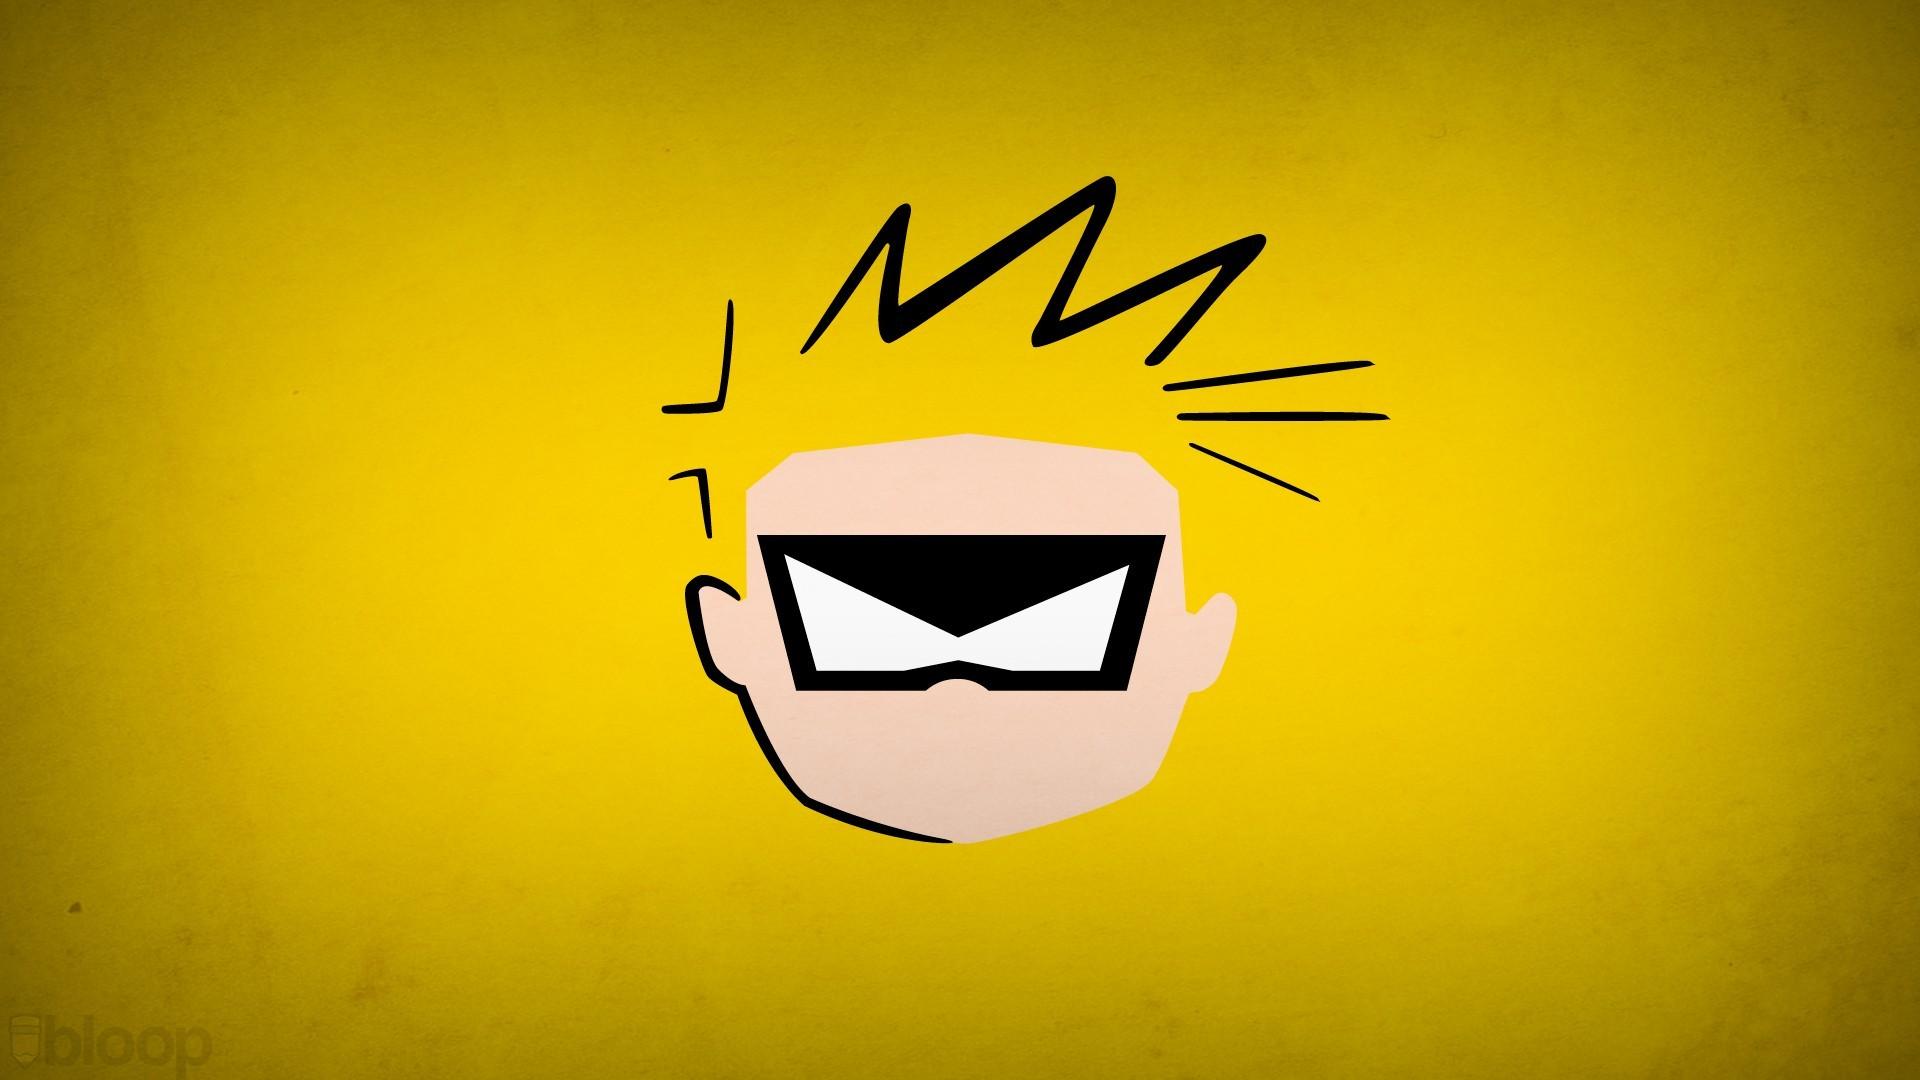 Calvin and hobbes comics superhero g wallpaper | | 162462 |  WallpaperUP